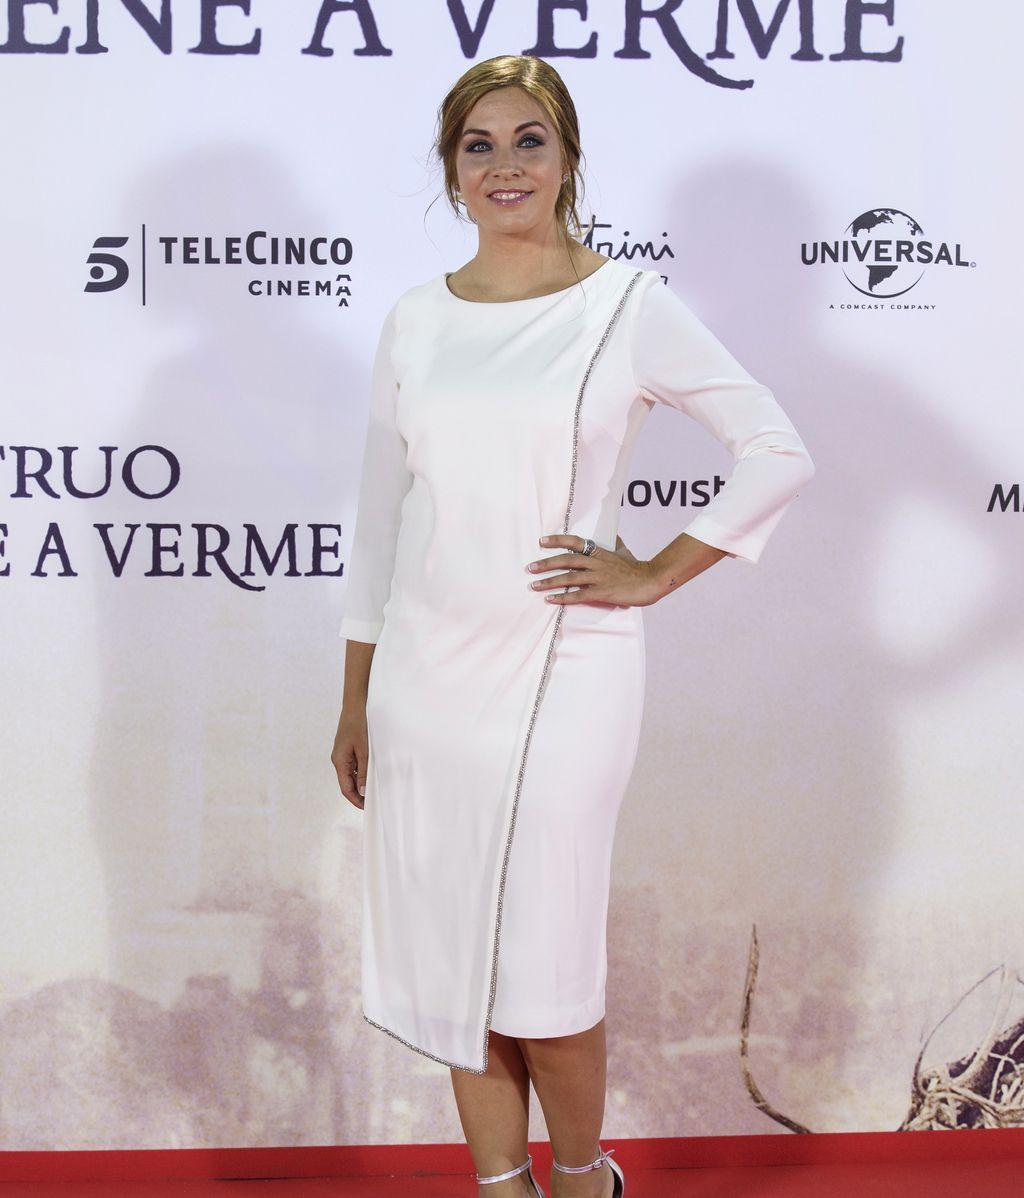 Leire Martínez